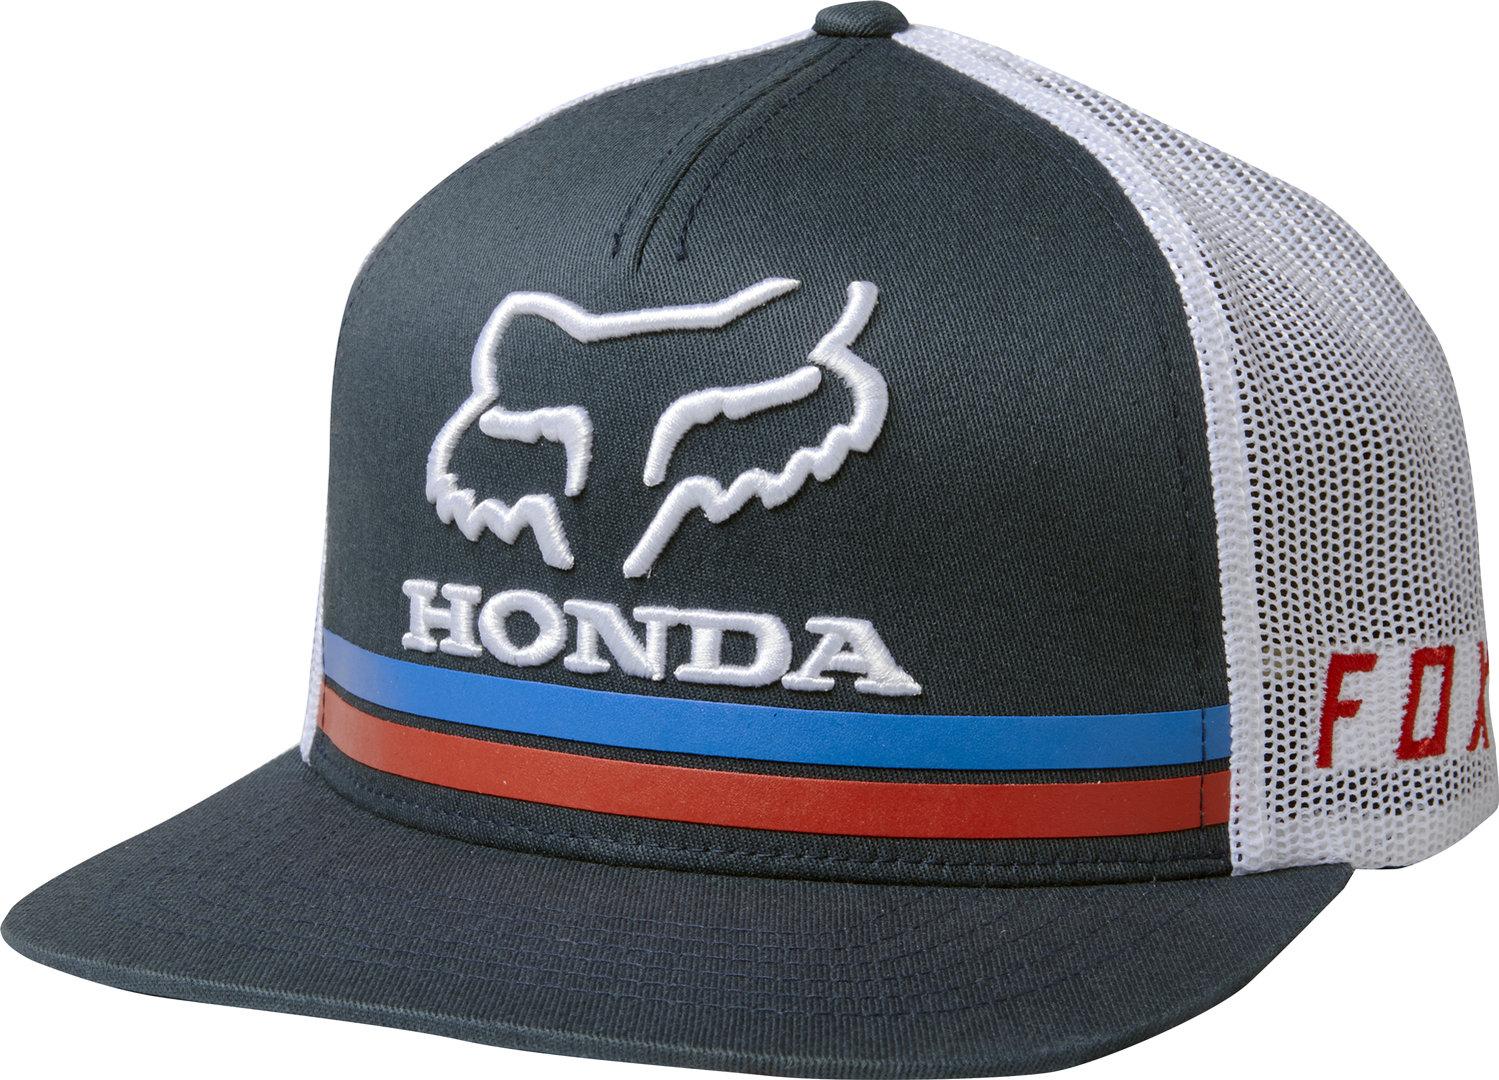 sports shoes 0cafb e1d6b Fox Racing HRC Fox Honda Snapback Hat Cap Unisex Motocross Style 22996-007  NVY ...